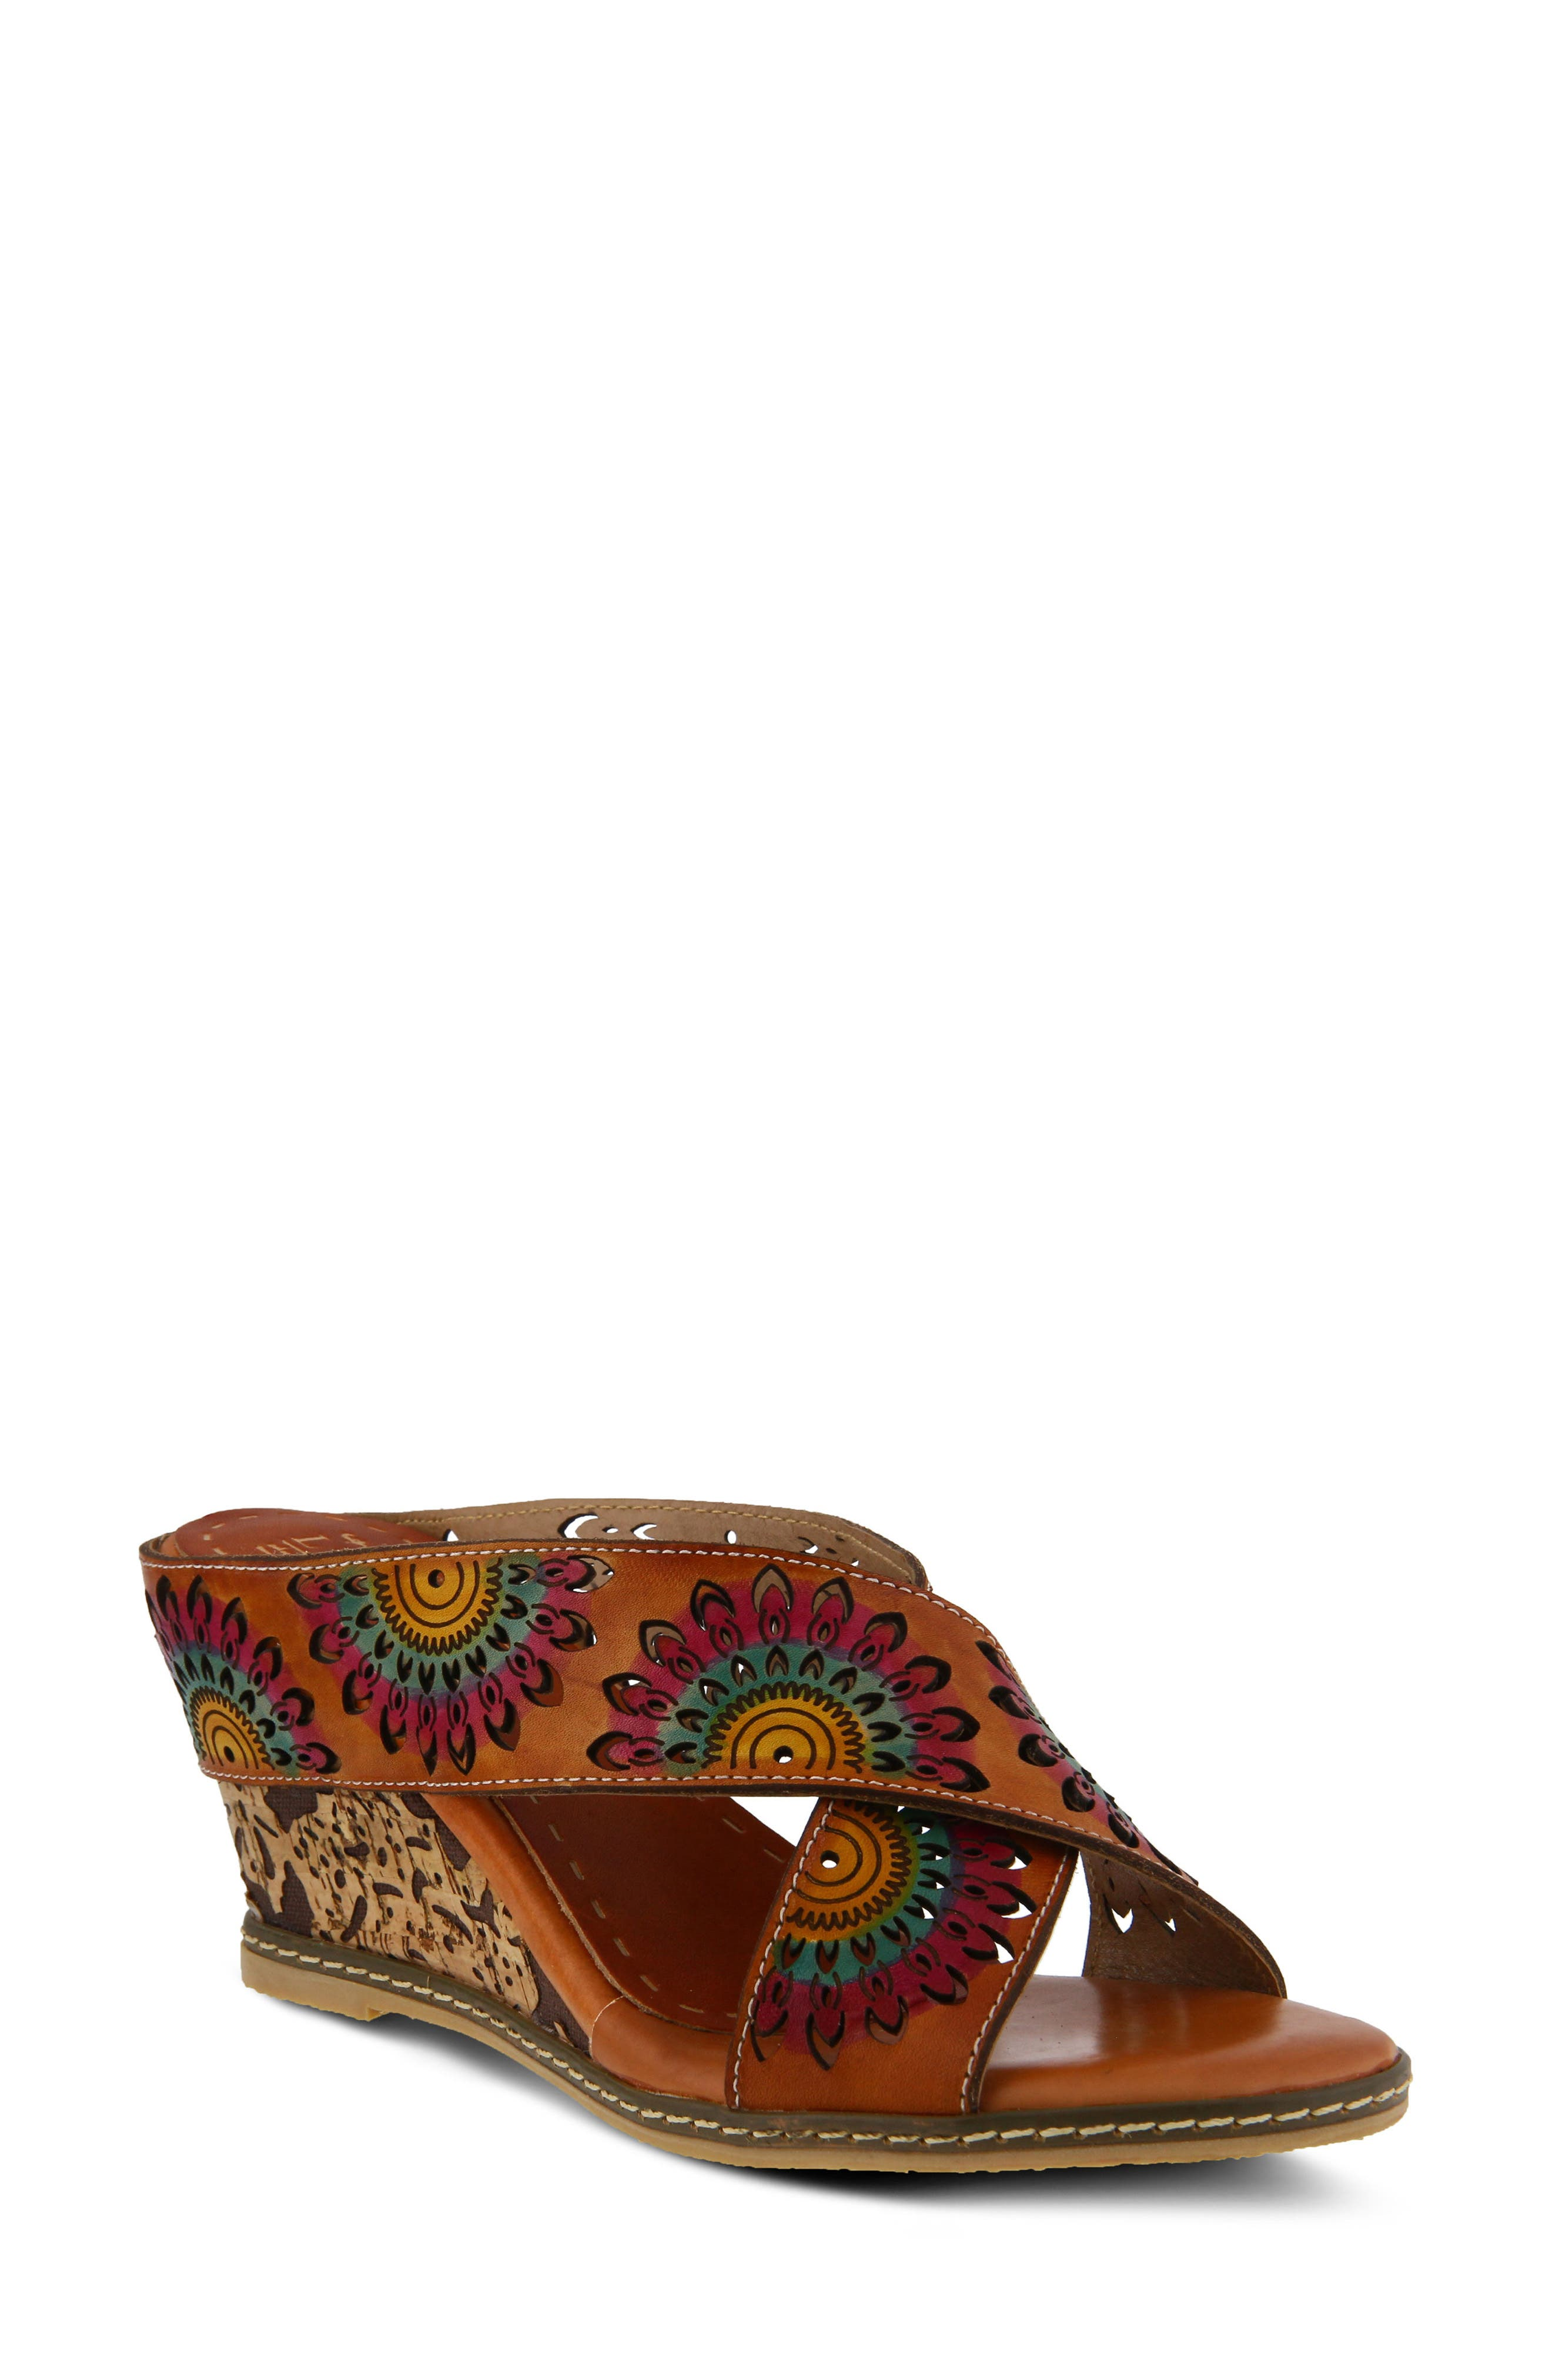 L'Artiste Enticing Wedge Sandal,                         Main,                         color, CAMEL LEATHER